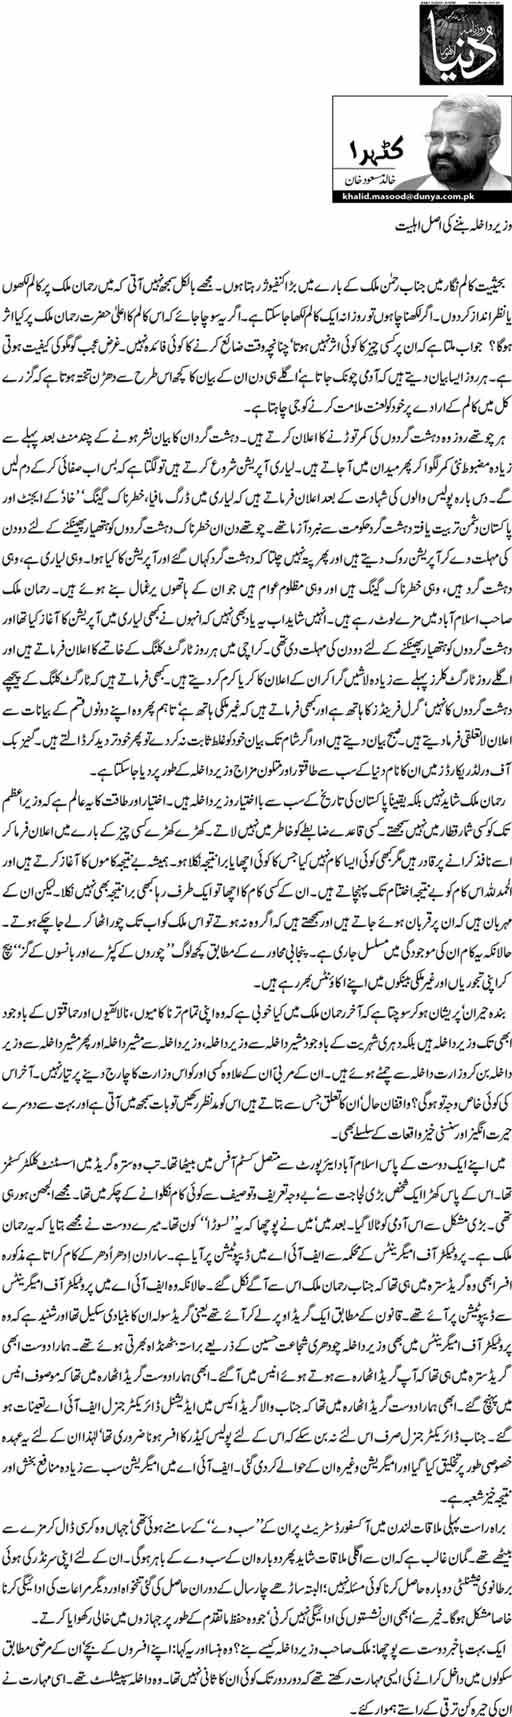 Wazeer e dakhla bannay ki asal ahliyyat - Khalid Masood Khan